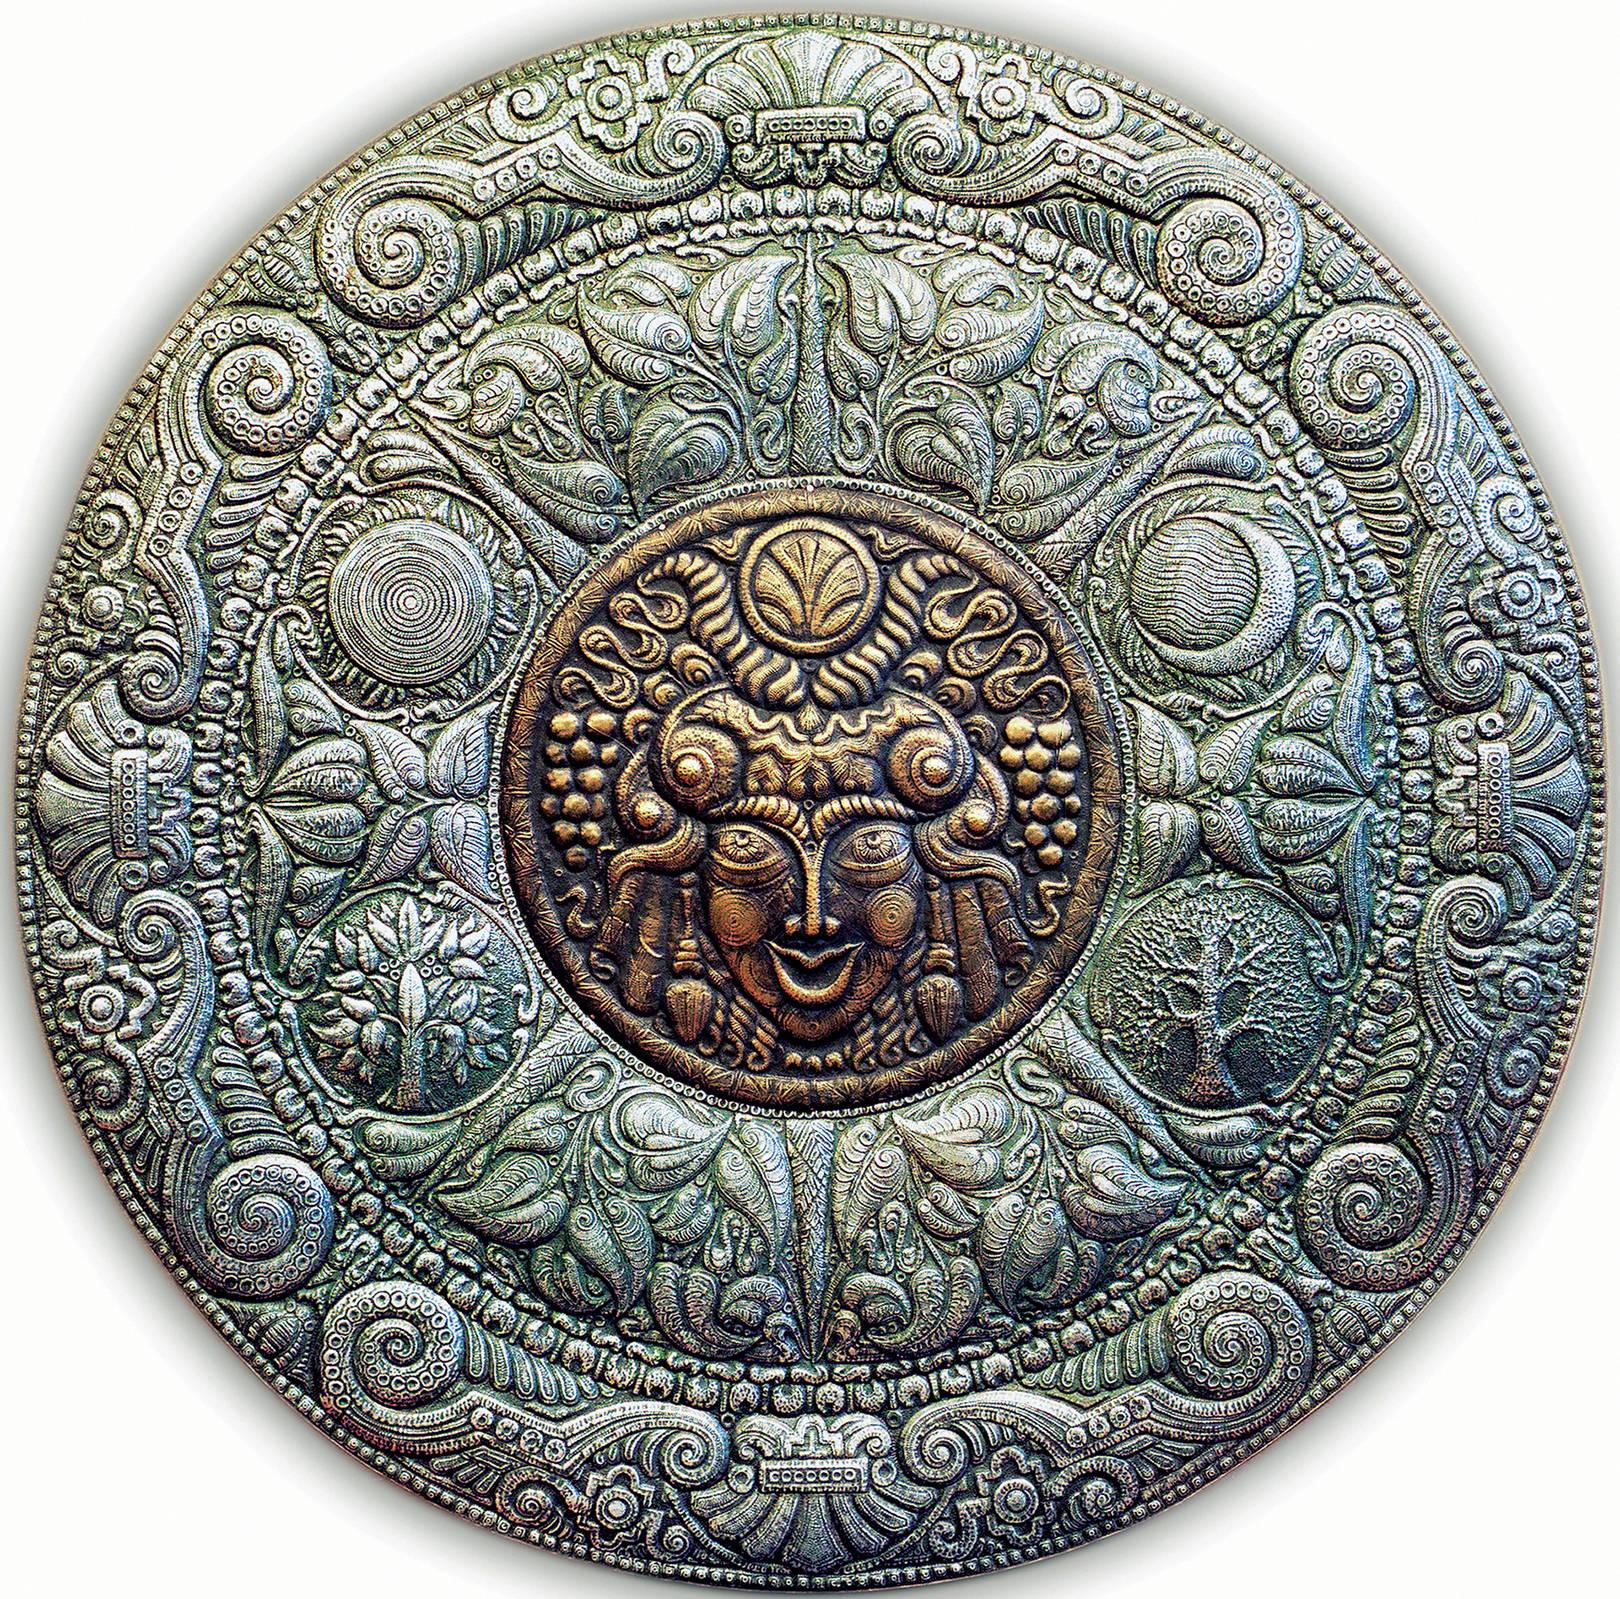 Кибела (панно) 1998 г. Алюминий, медь; чернение 80 х 80 см